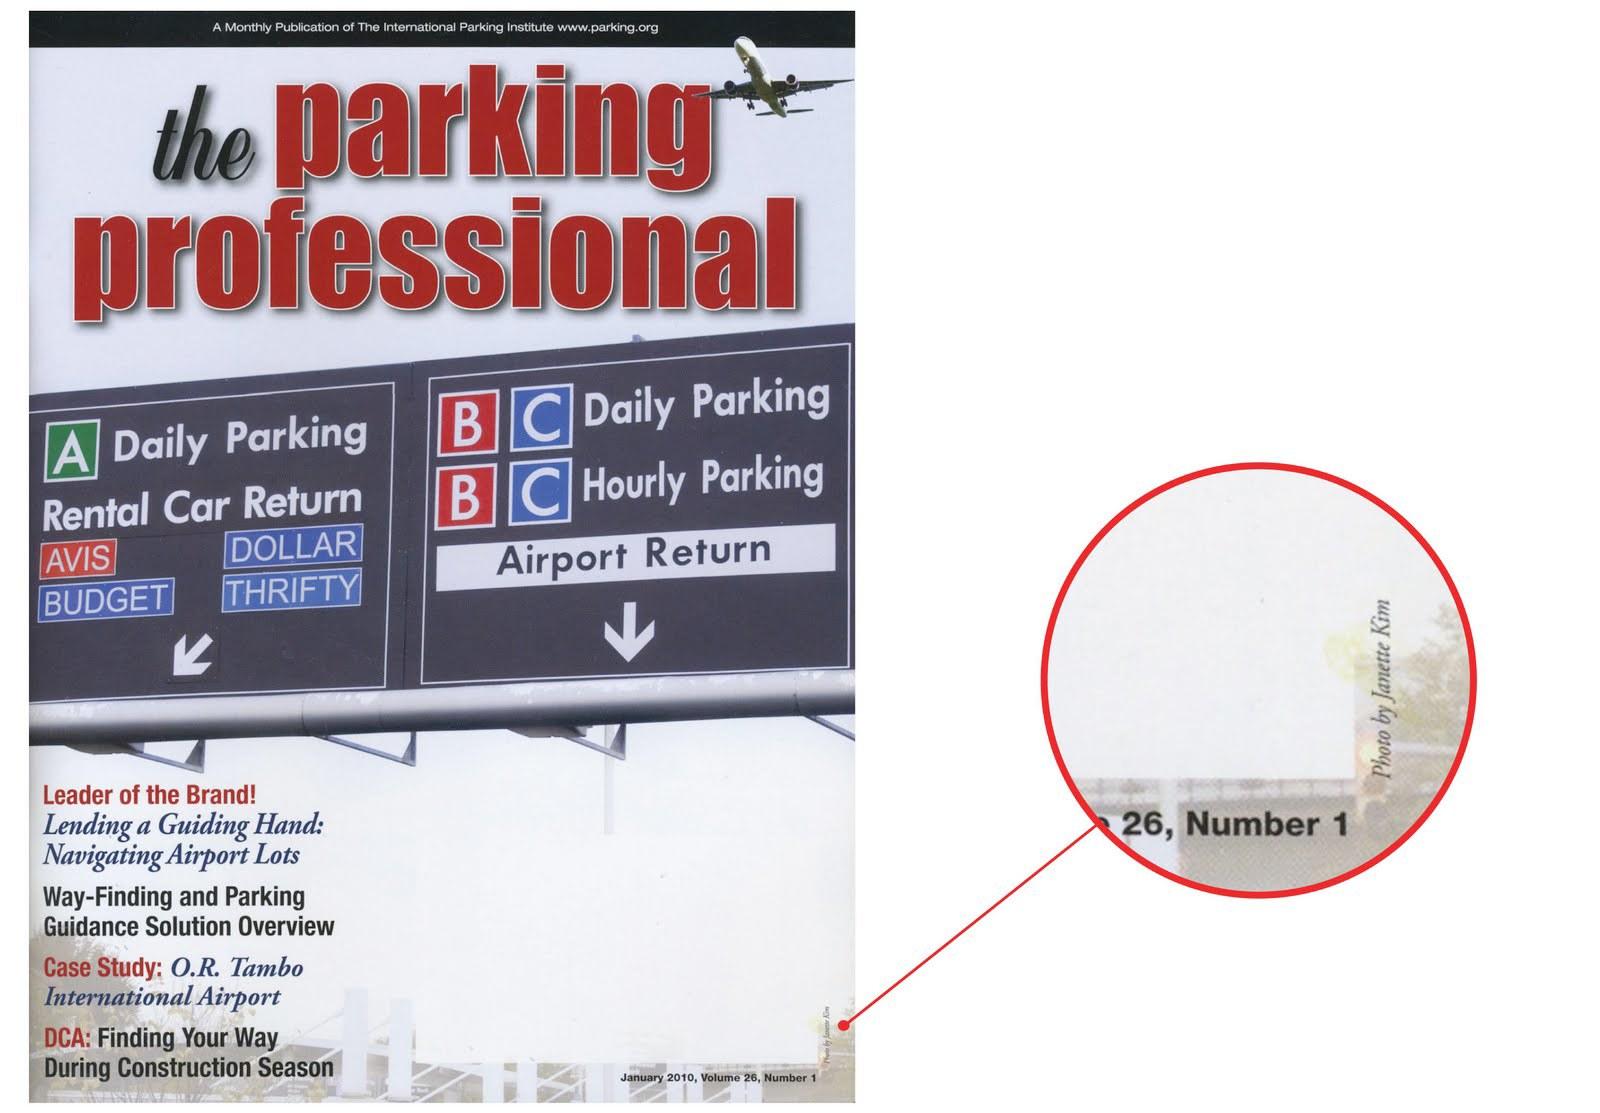 The Parking Professional Magazine